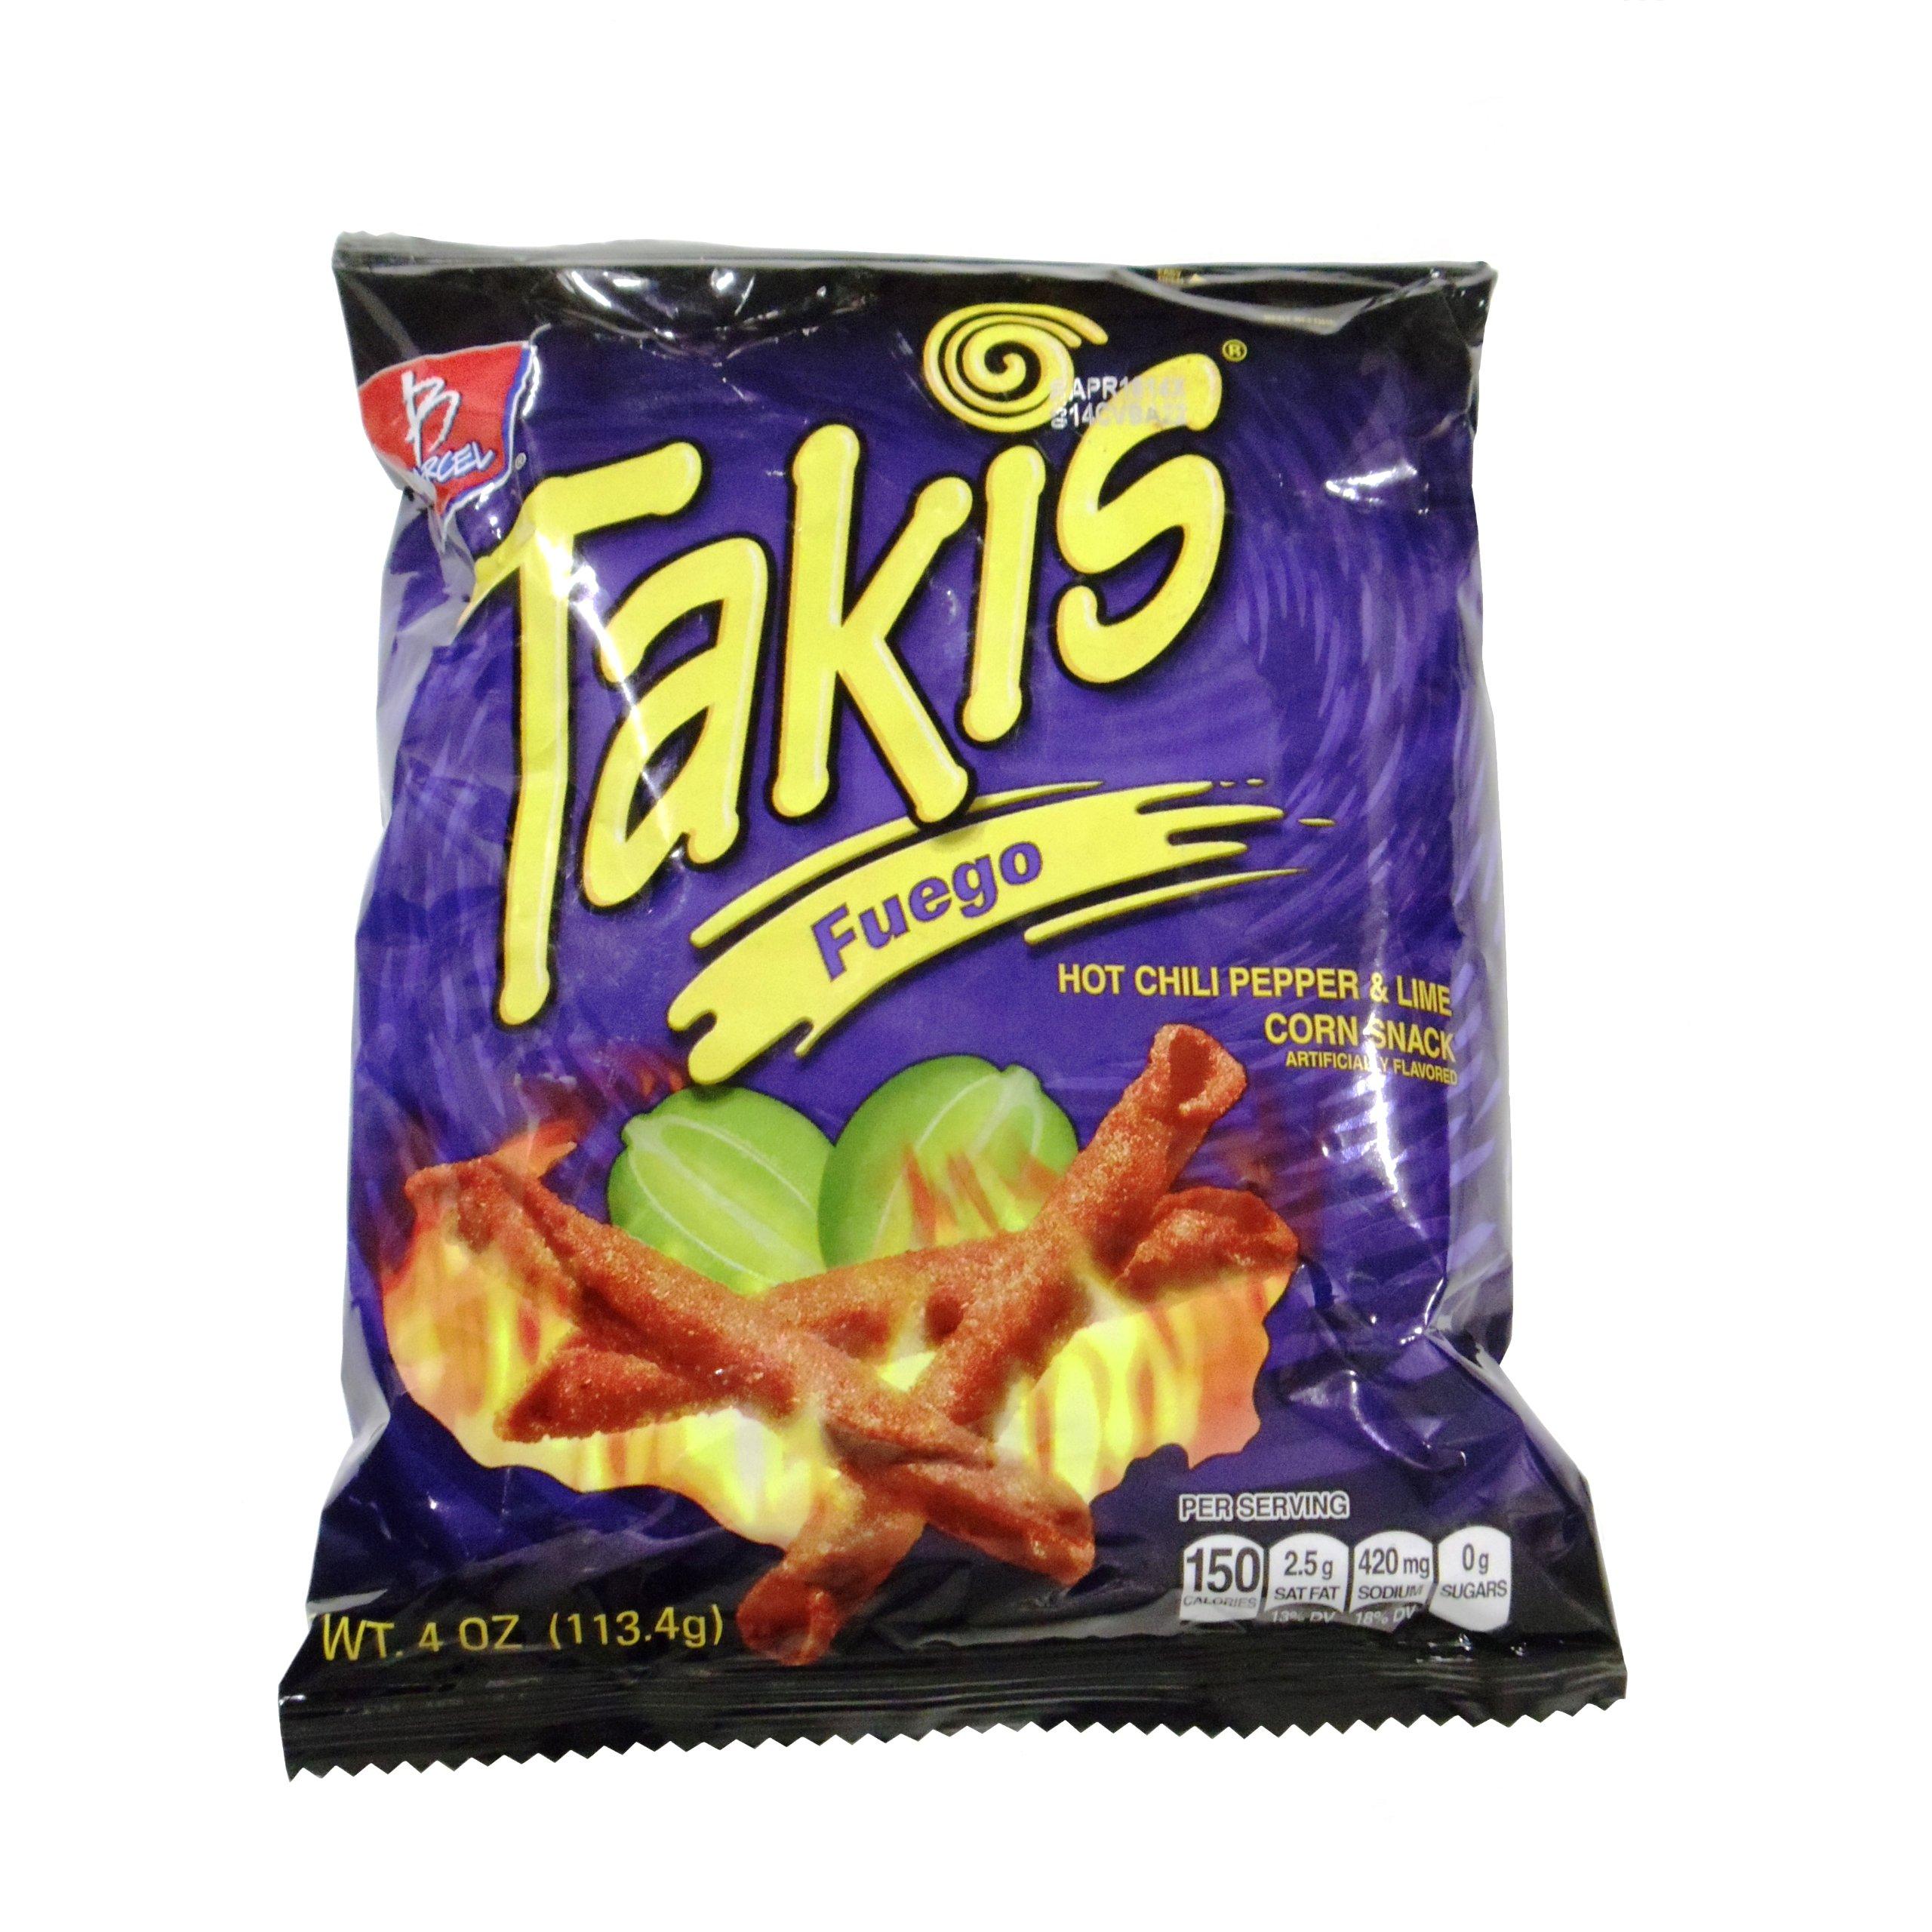 Takis Fuego Box Of 46 Bags 1 Oz Each Hot Chili Pepper